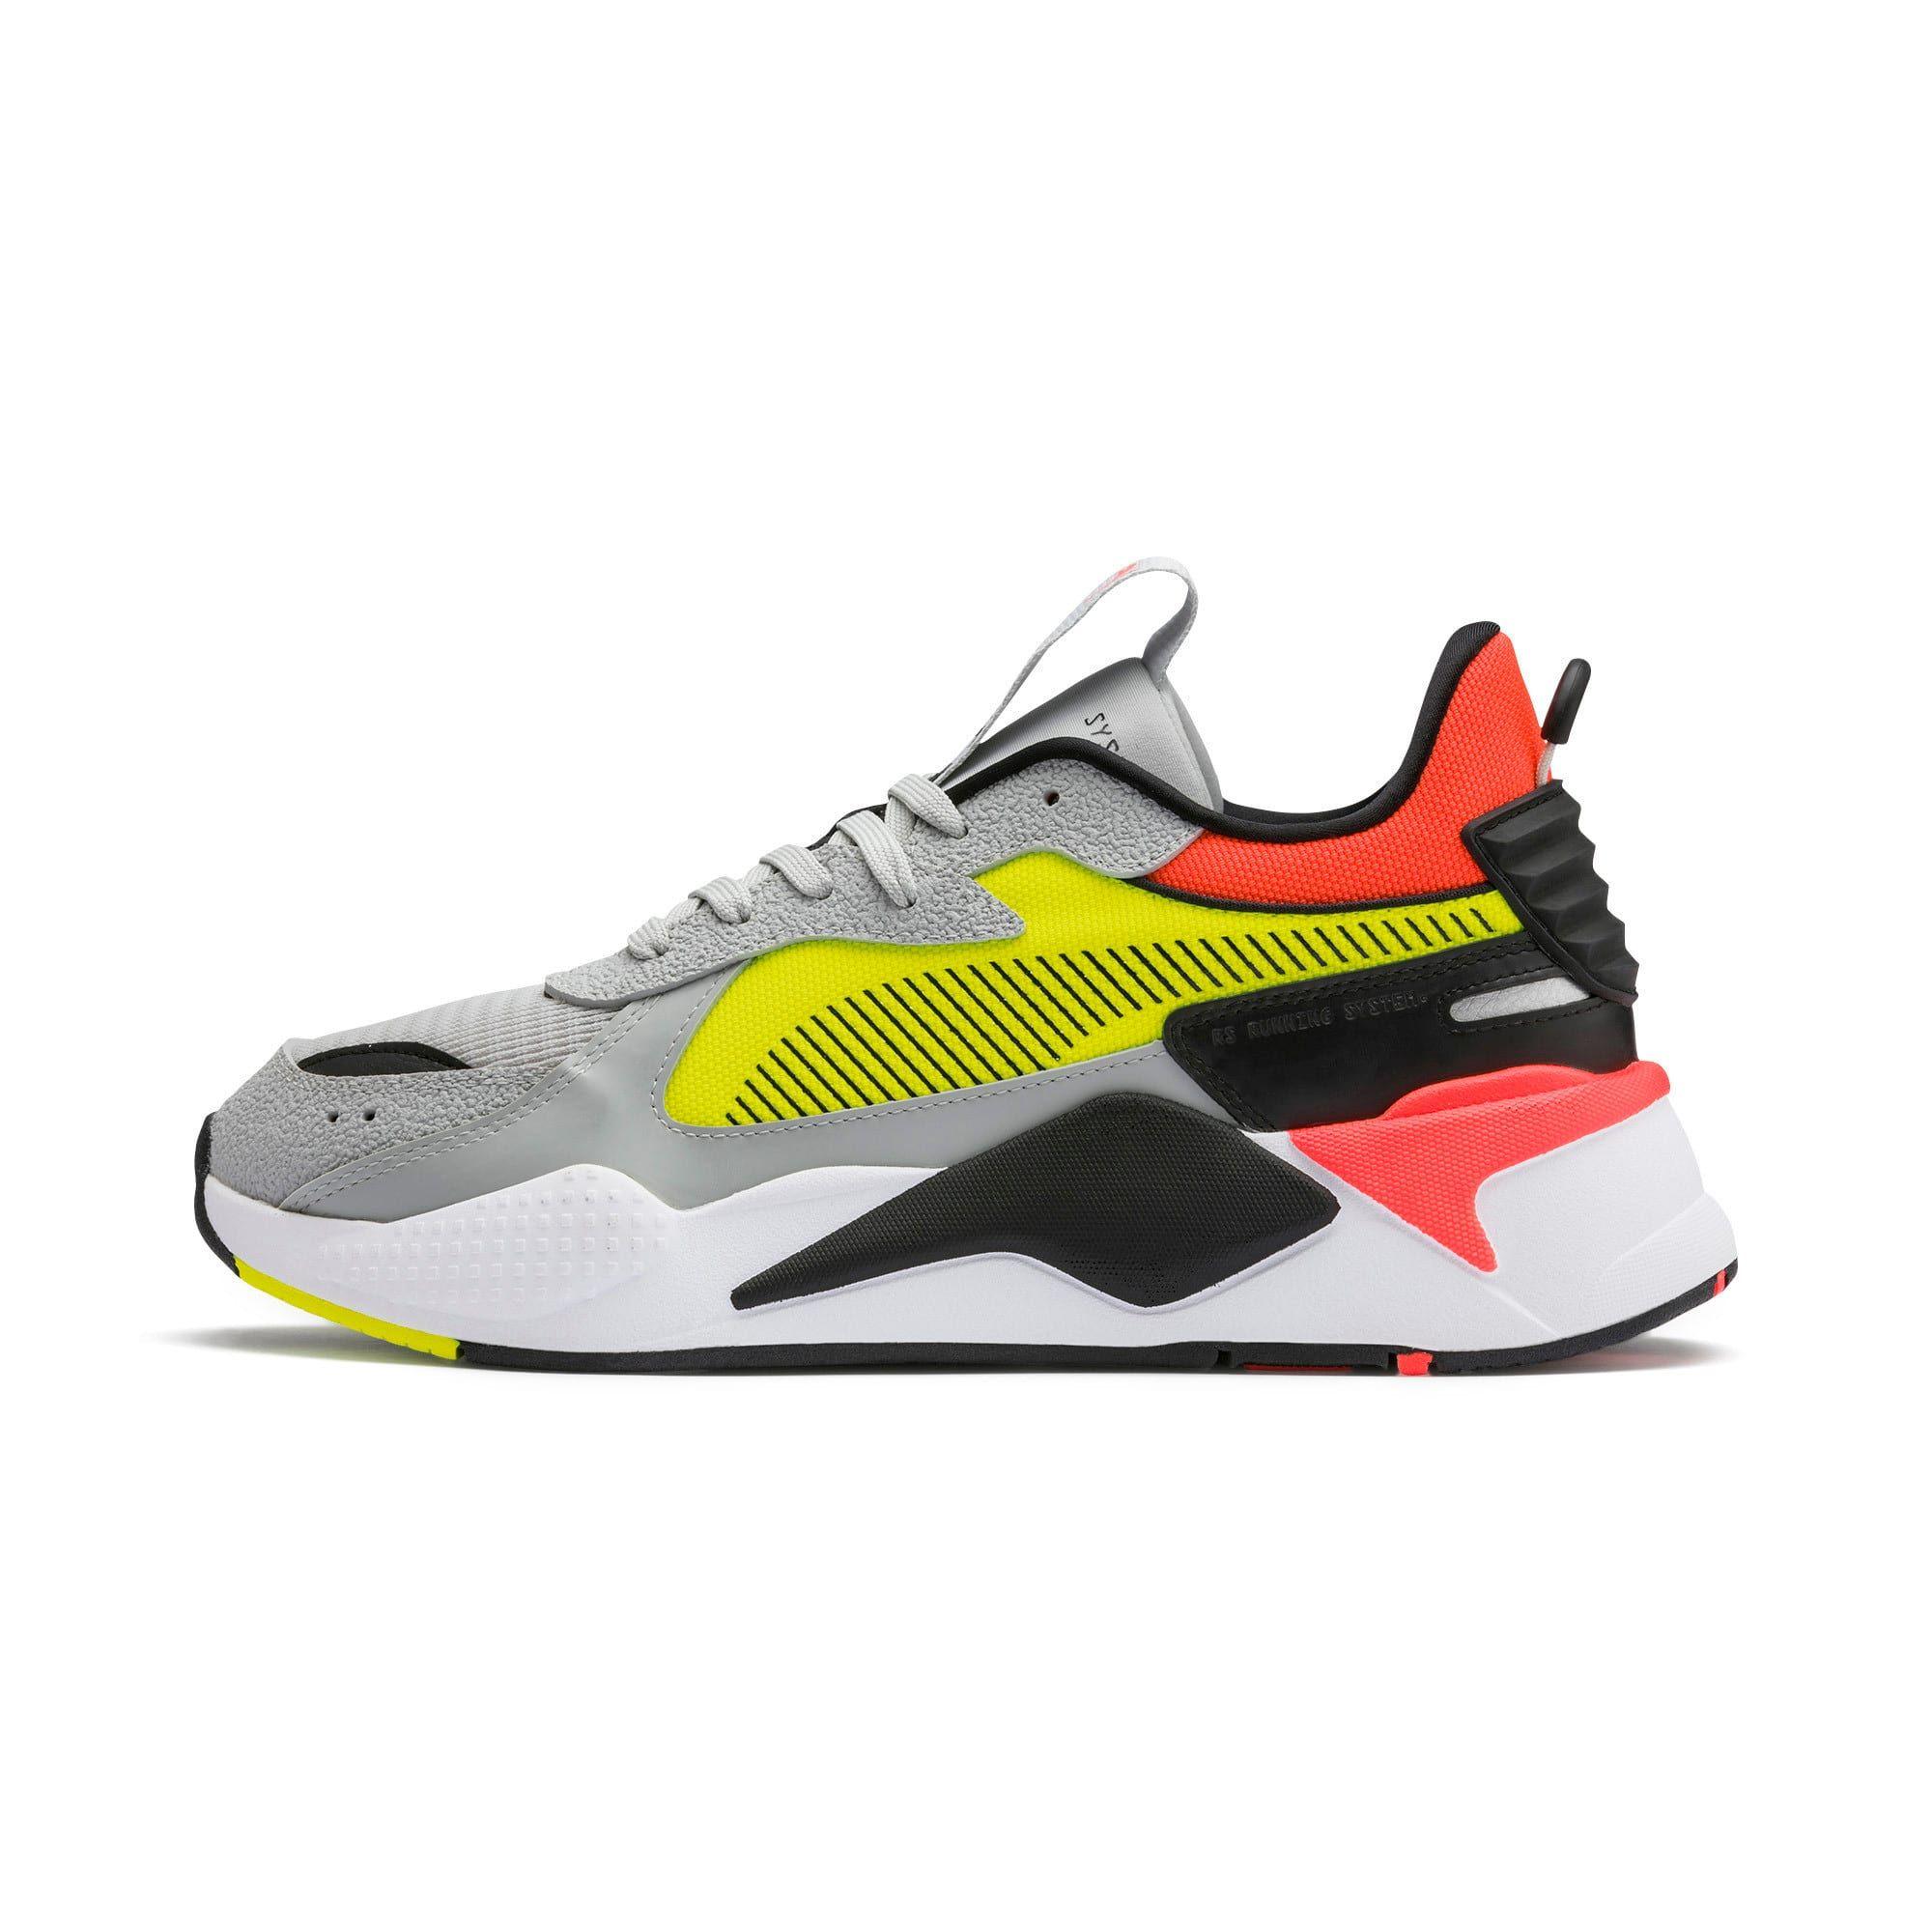 Basket RS-X Tracks Drive   Plastic heels, Puma mens, Trainers